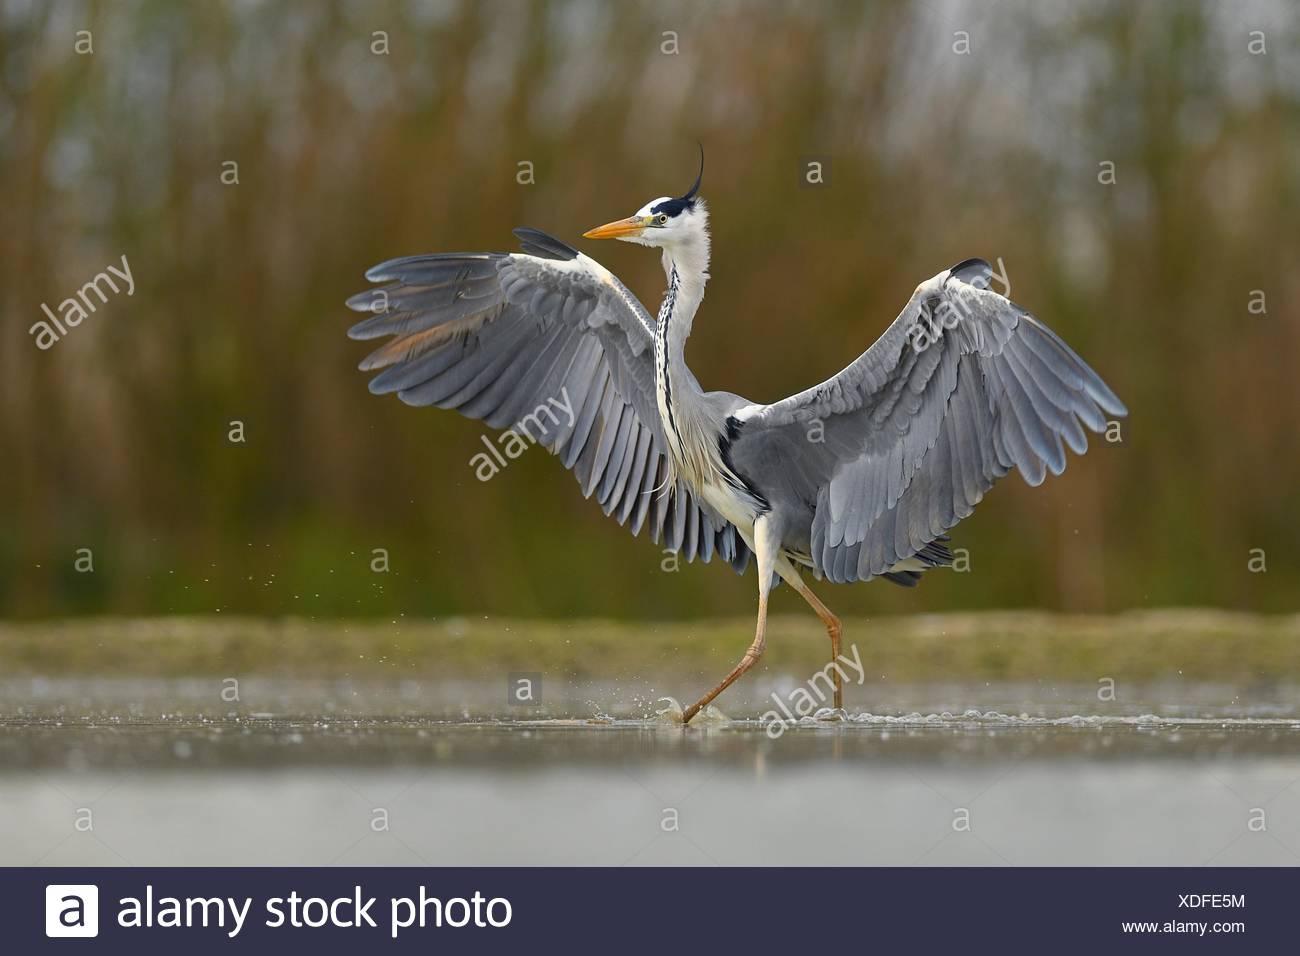 Grey heron (Ardea cinerea), walks in the water, National Park Kiskunsag, Hungary Stock Photo